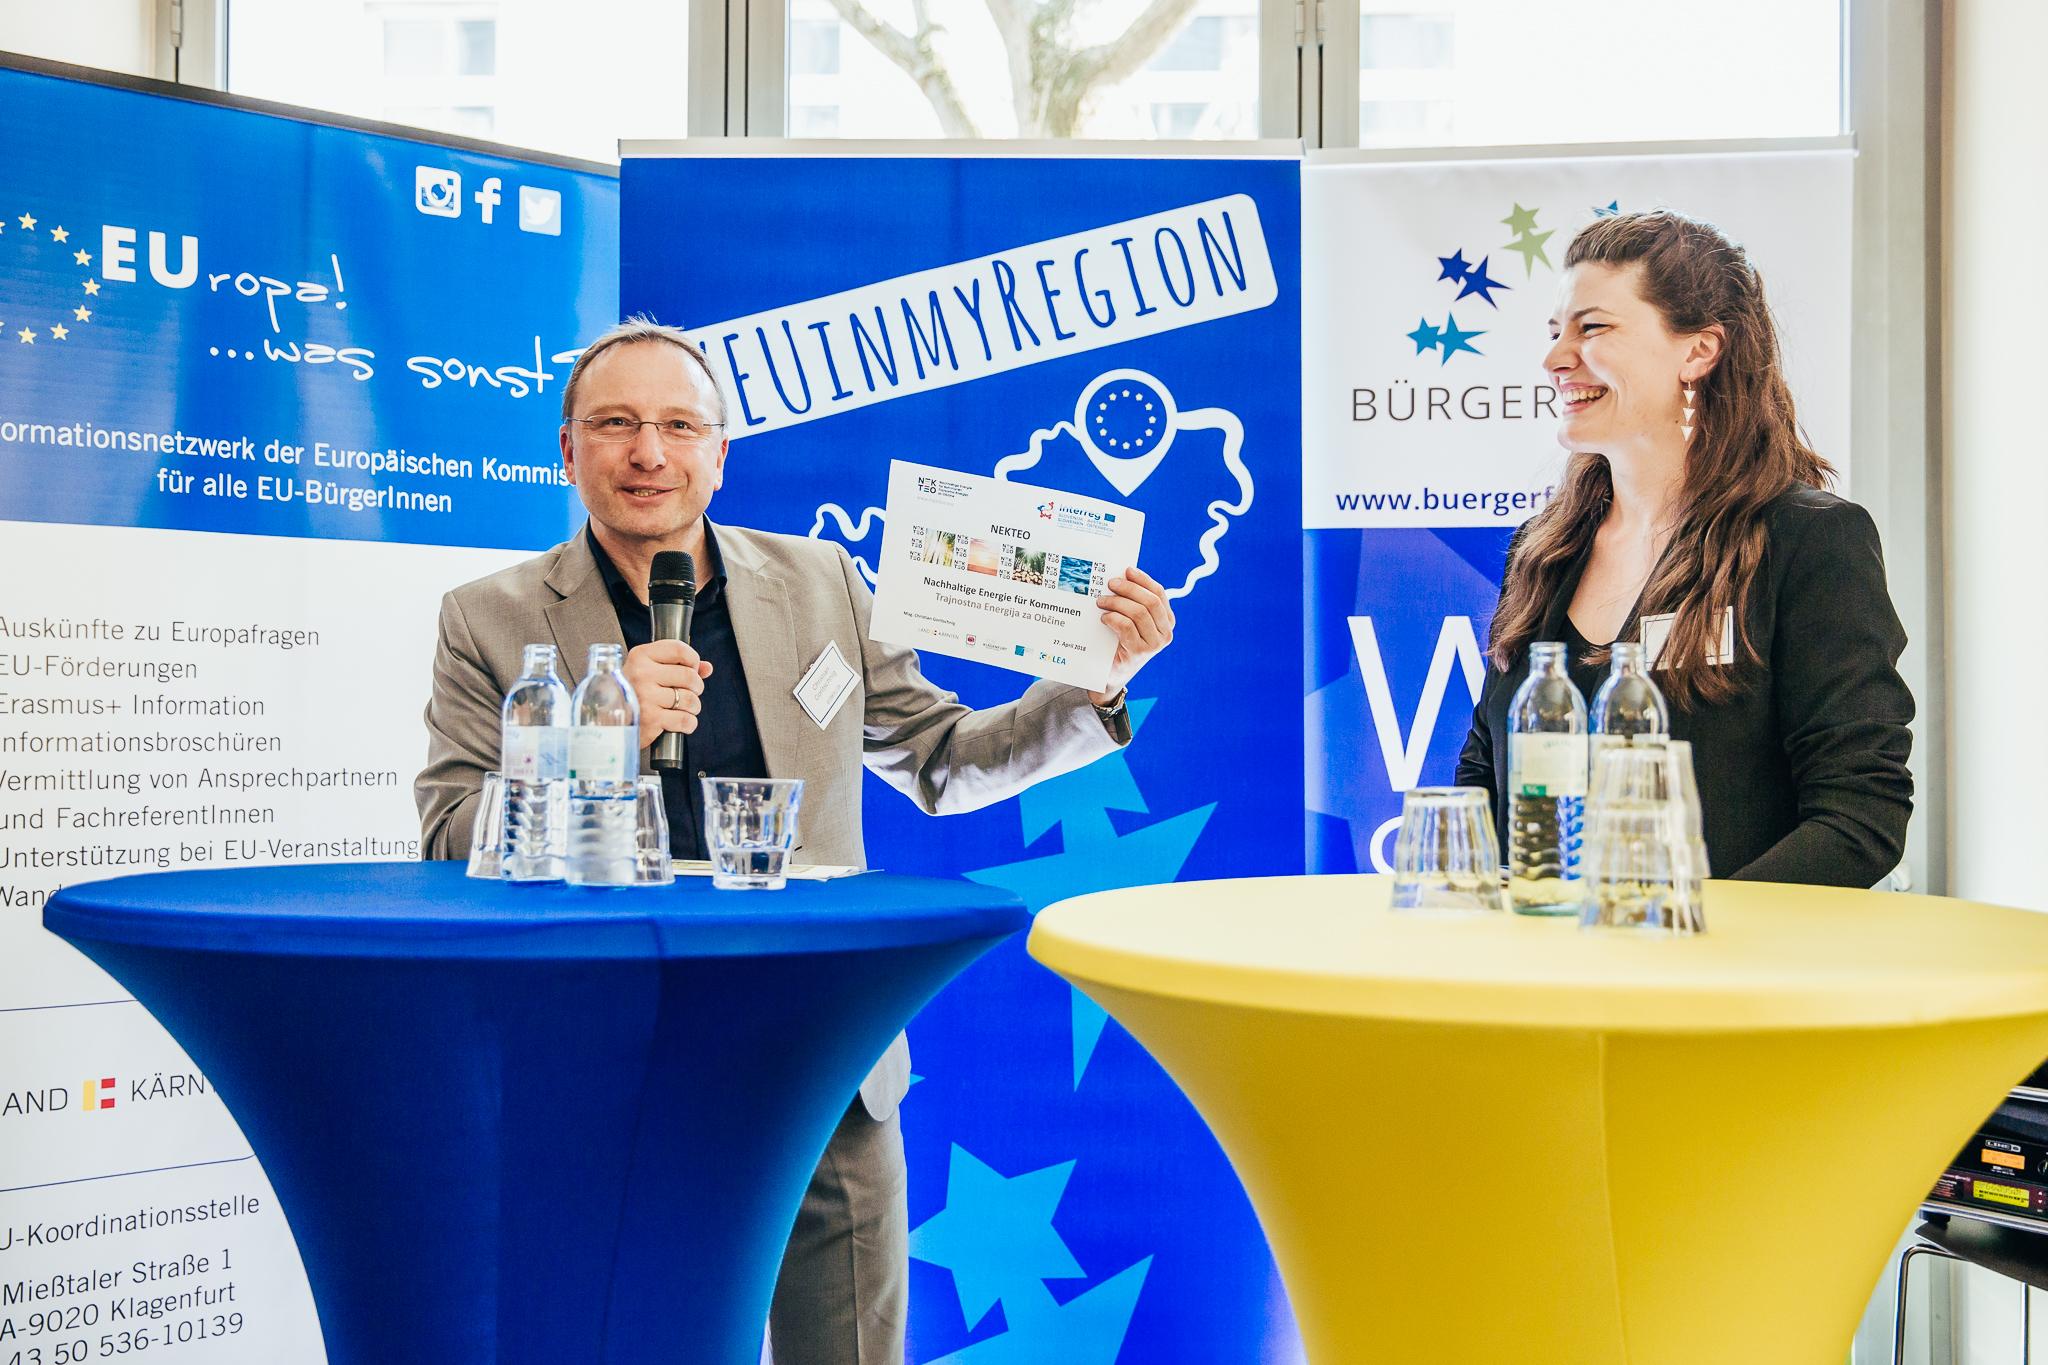 #EUINMYREGION_27042018_Klagenfurt_32_web.jpg